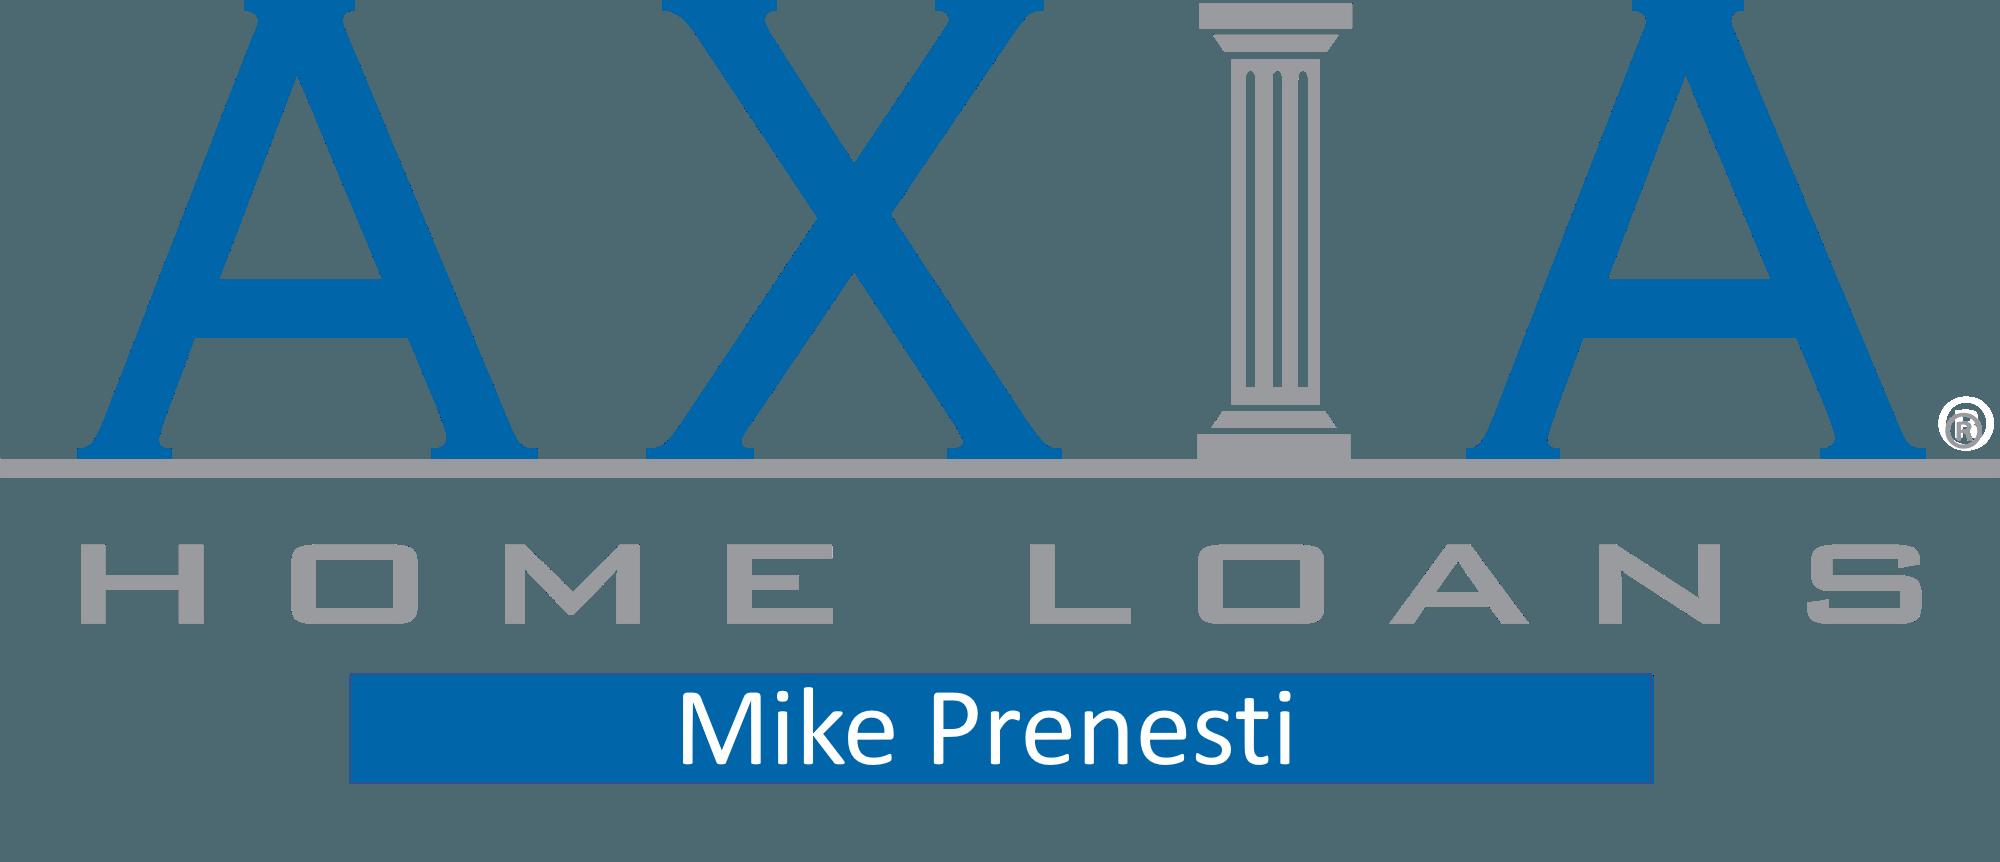 Axia Home Loans - Mike Prenesti